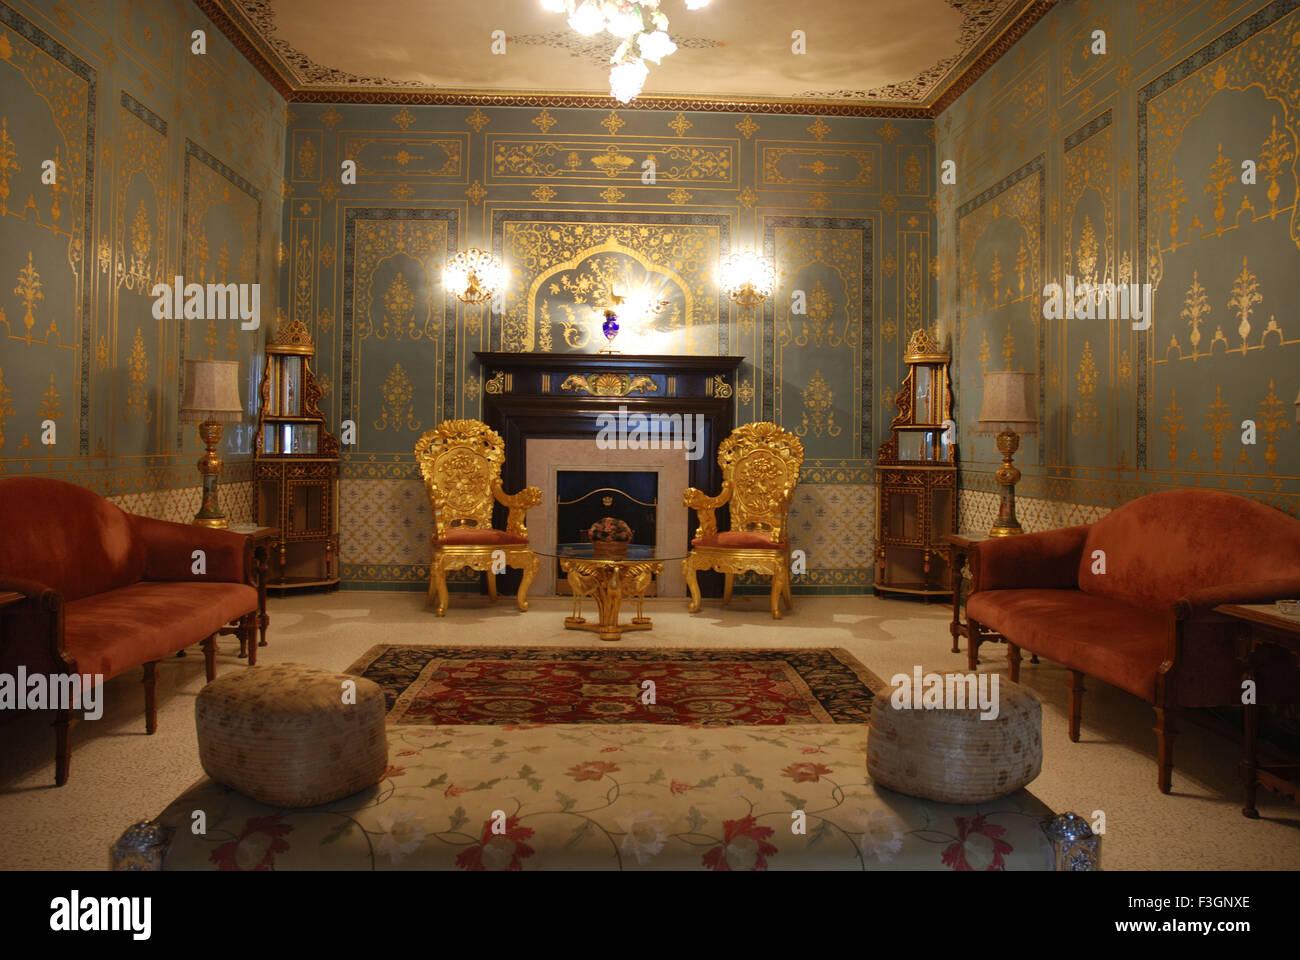 Gold work in room Rampuria Haveli now hotel Bhanwar Niwas ; Bikaner ; Rajasthan ; India - Stock Image